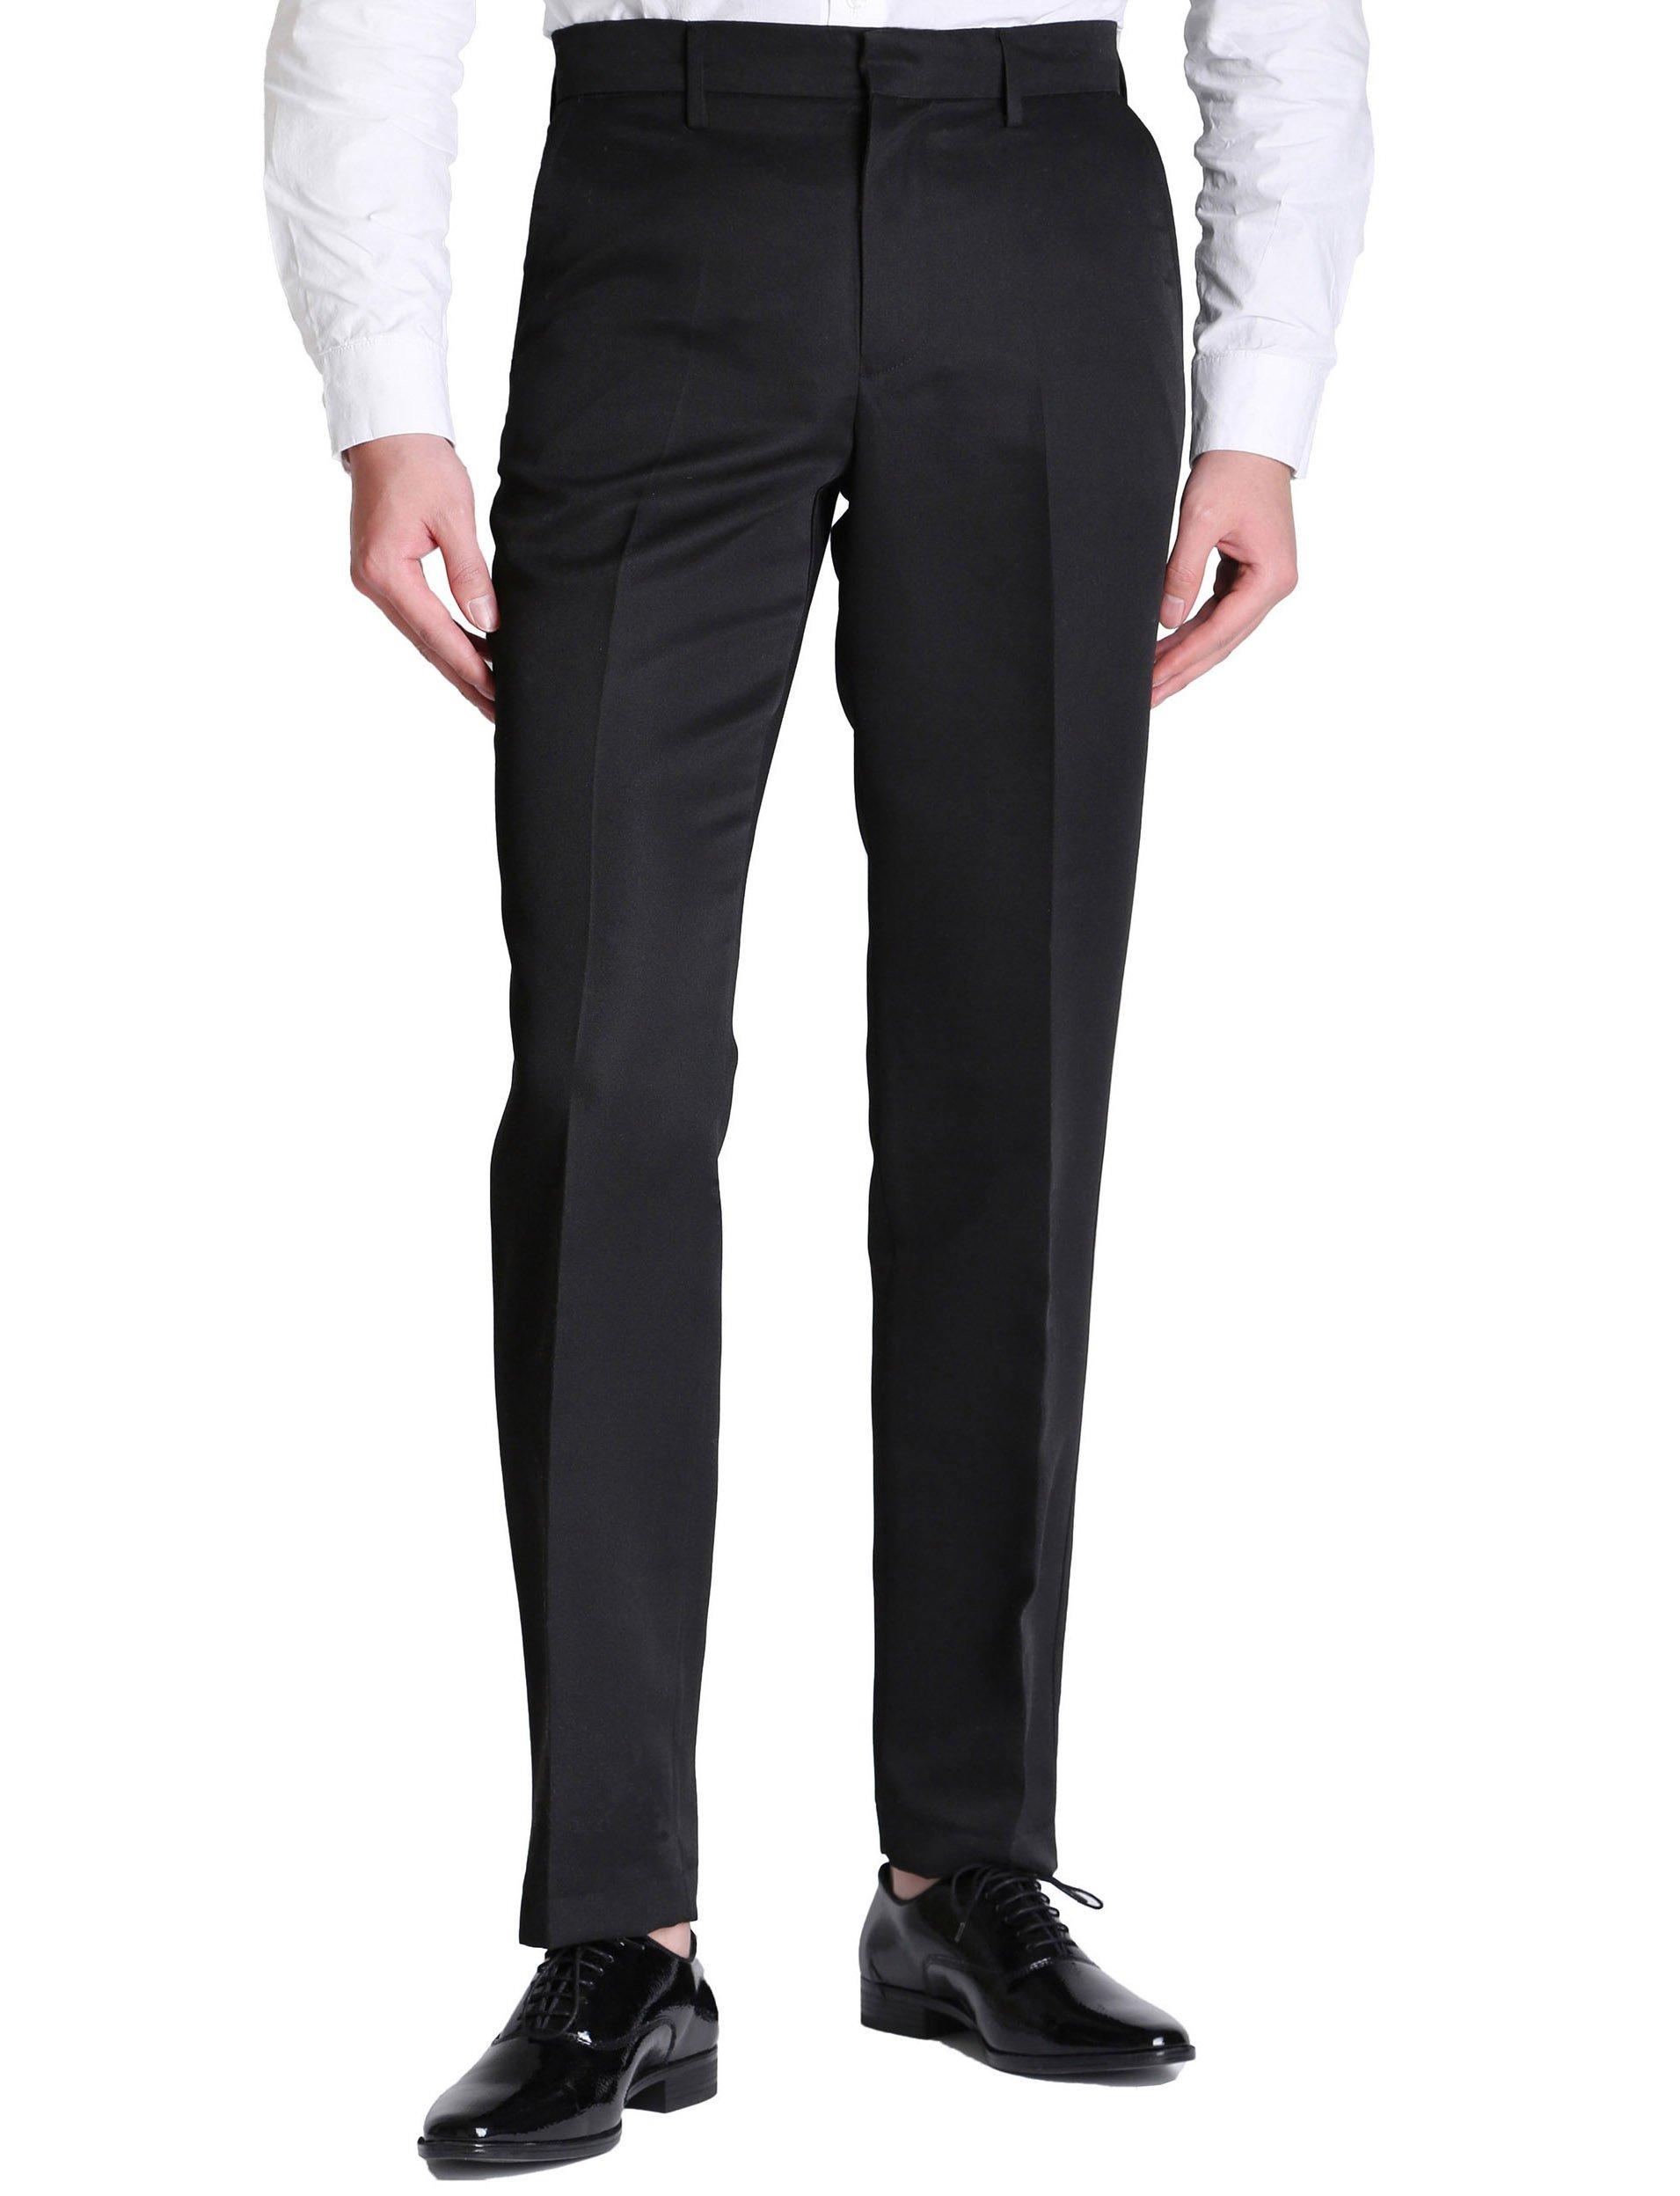 Vero Viva Men's Straight Leg Fit Flat Front Dress Pants Business Casual Trousers(34W32L,Black)